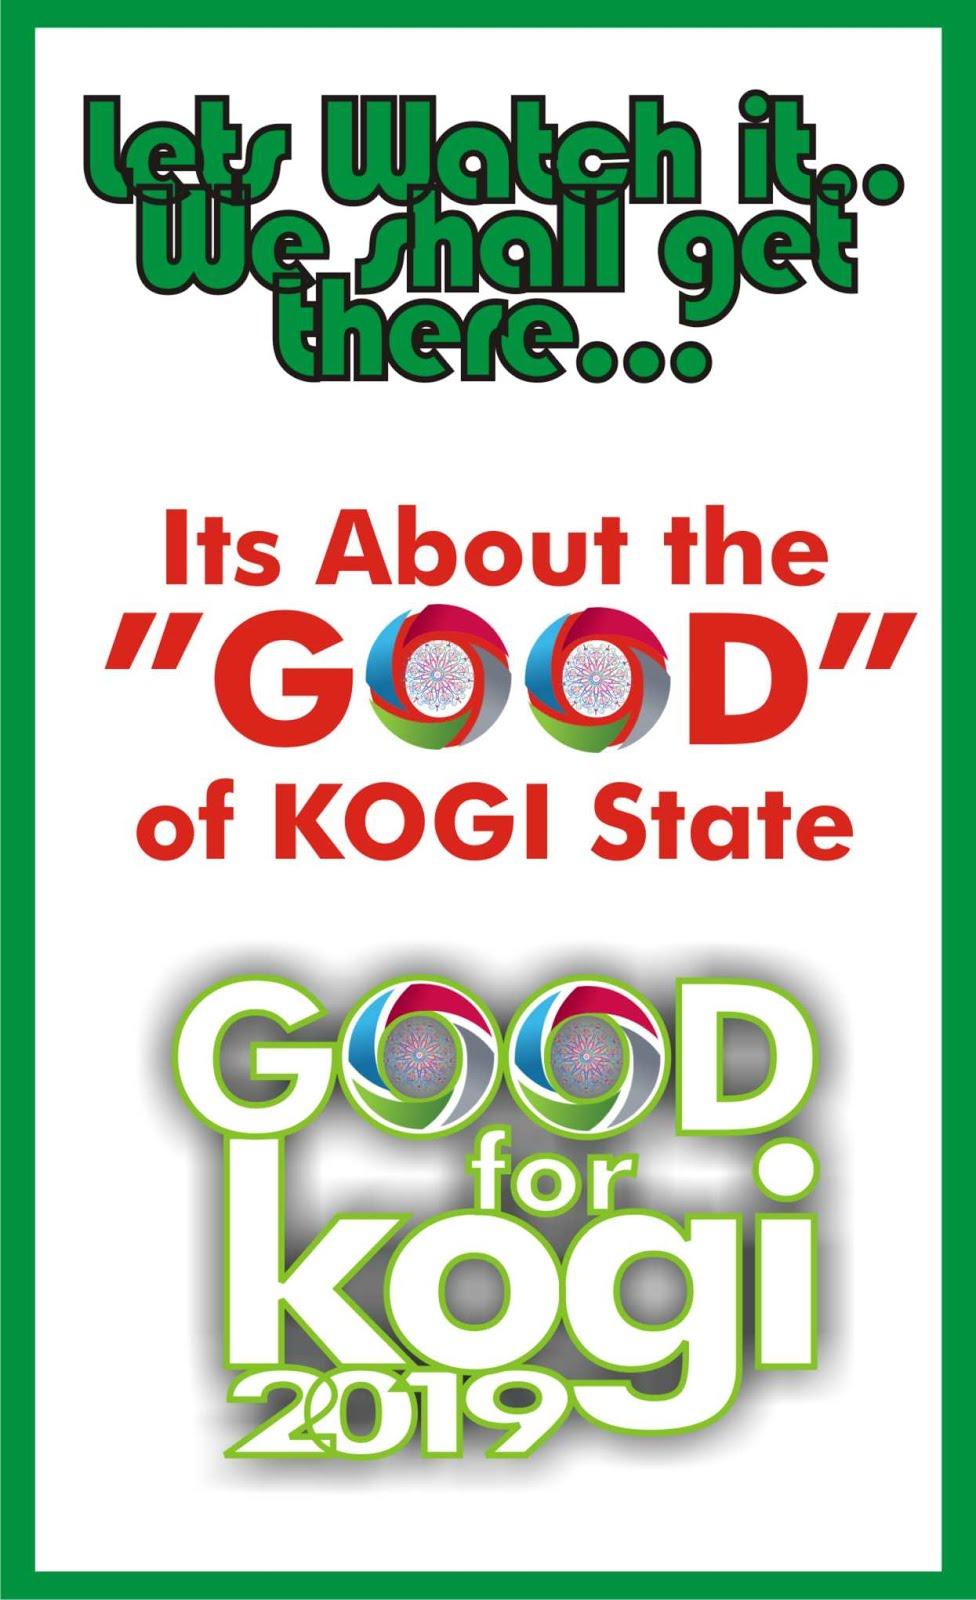 THE GOOD OF KOGI STATE